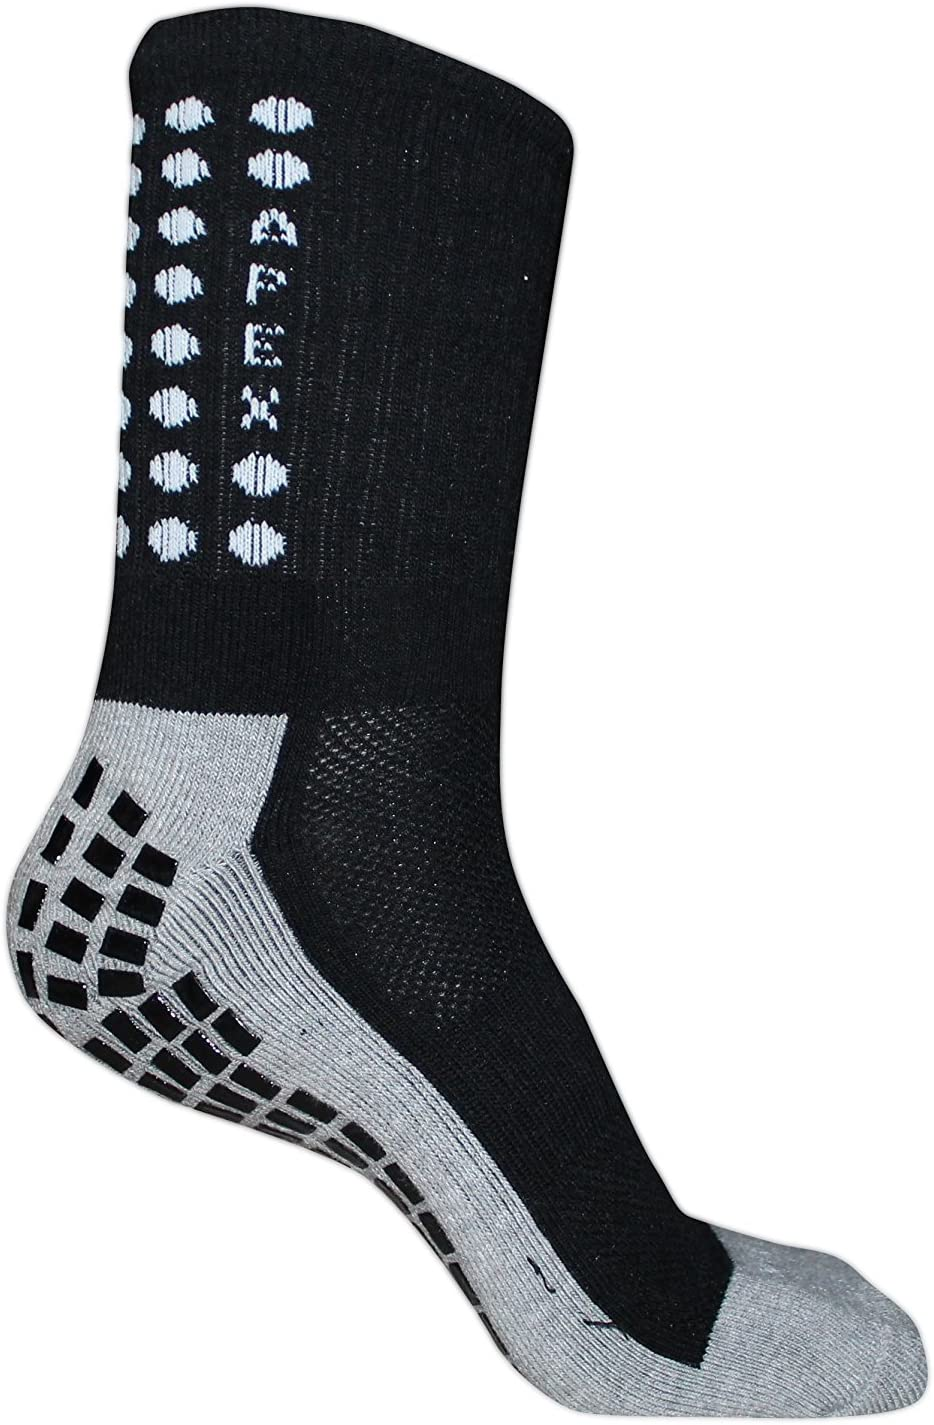 Apex #1 Non Slip Sport Socks, The Best Traction Technology Inside and Outside of Socks, No More Blisters, Grip Socks